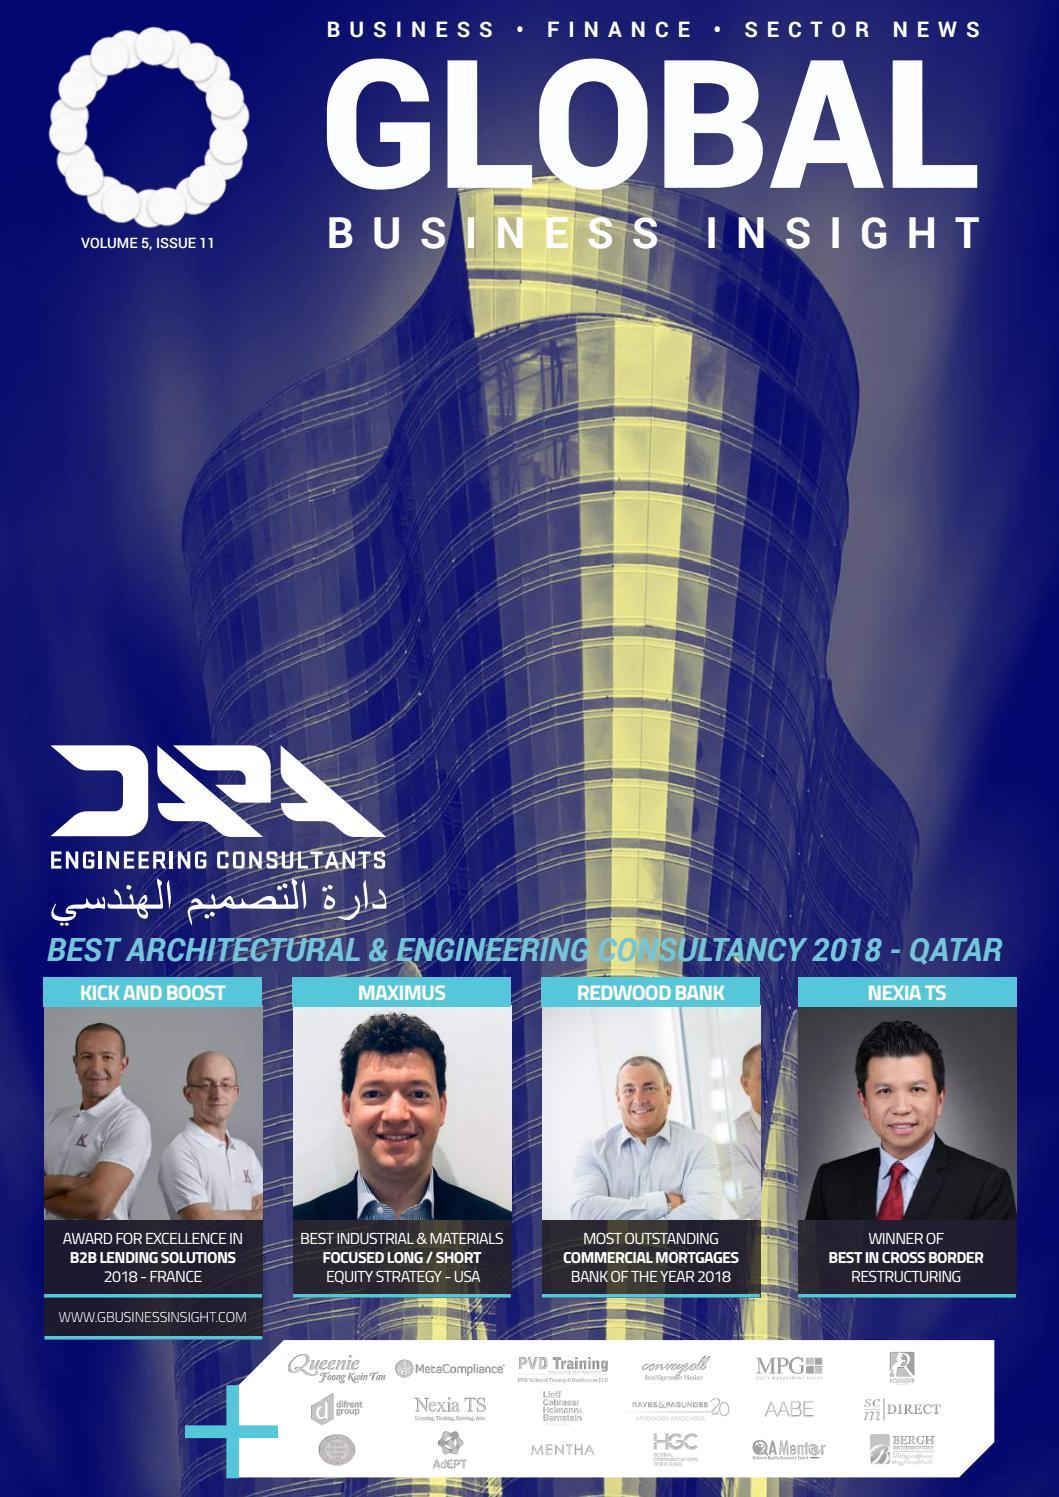 9dbe7b865b Global Business Insight Volume 5 Issue 11 by gbusinessinsight - issuu